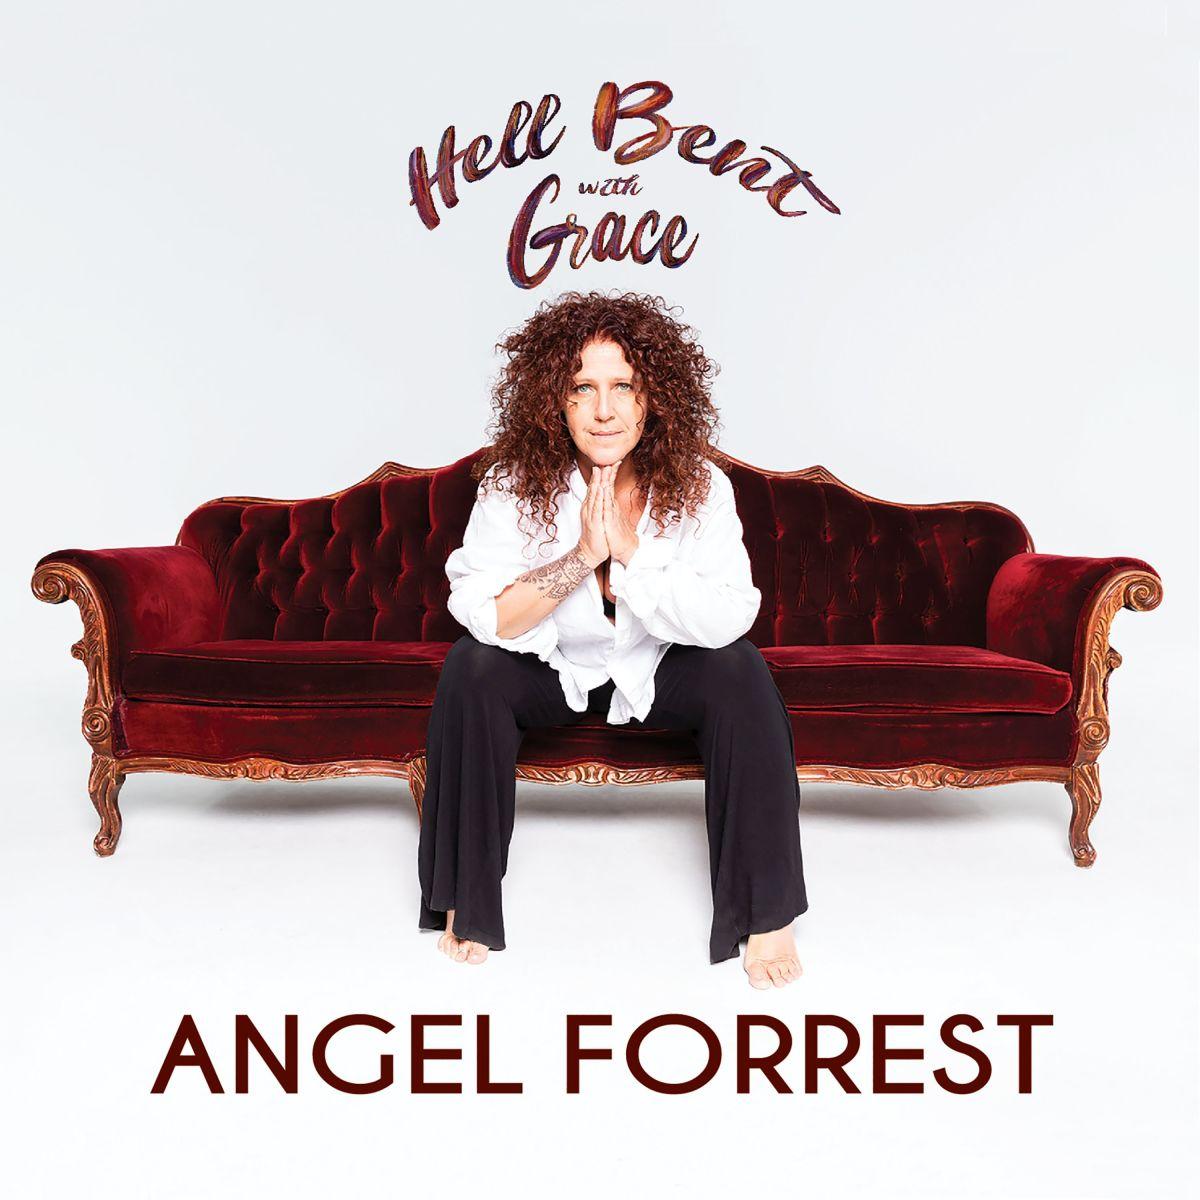 Angel Forrest